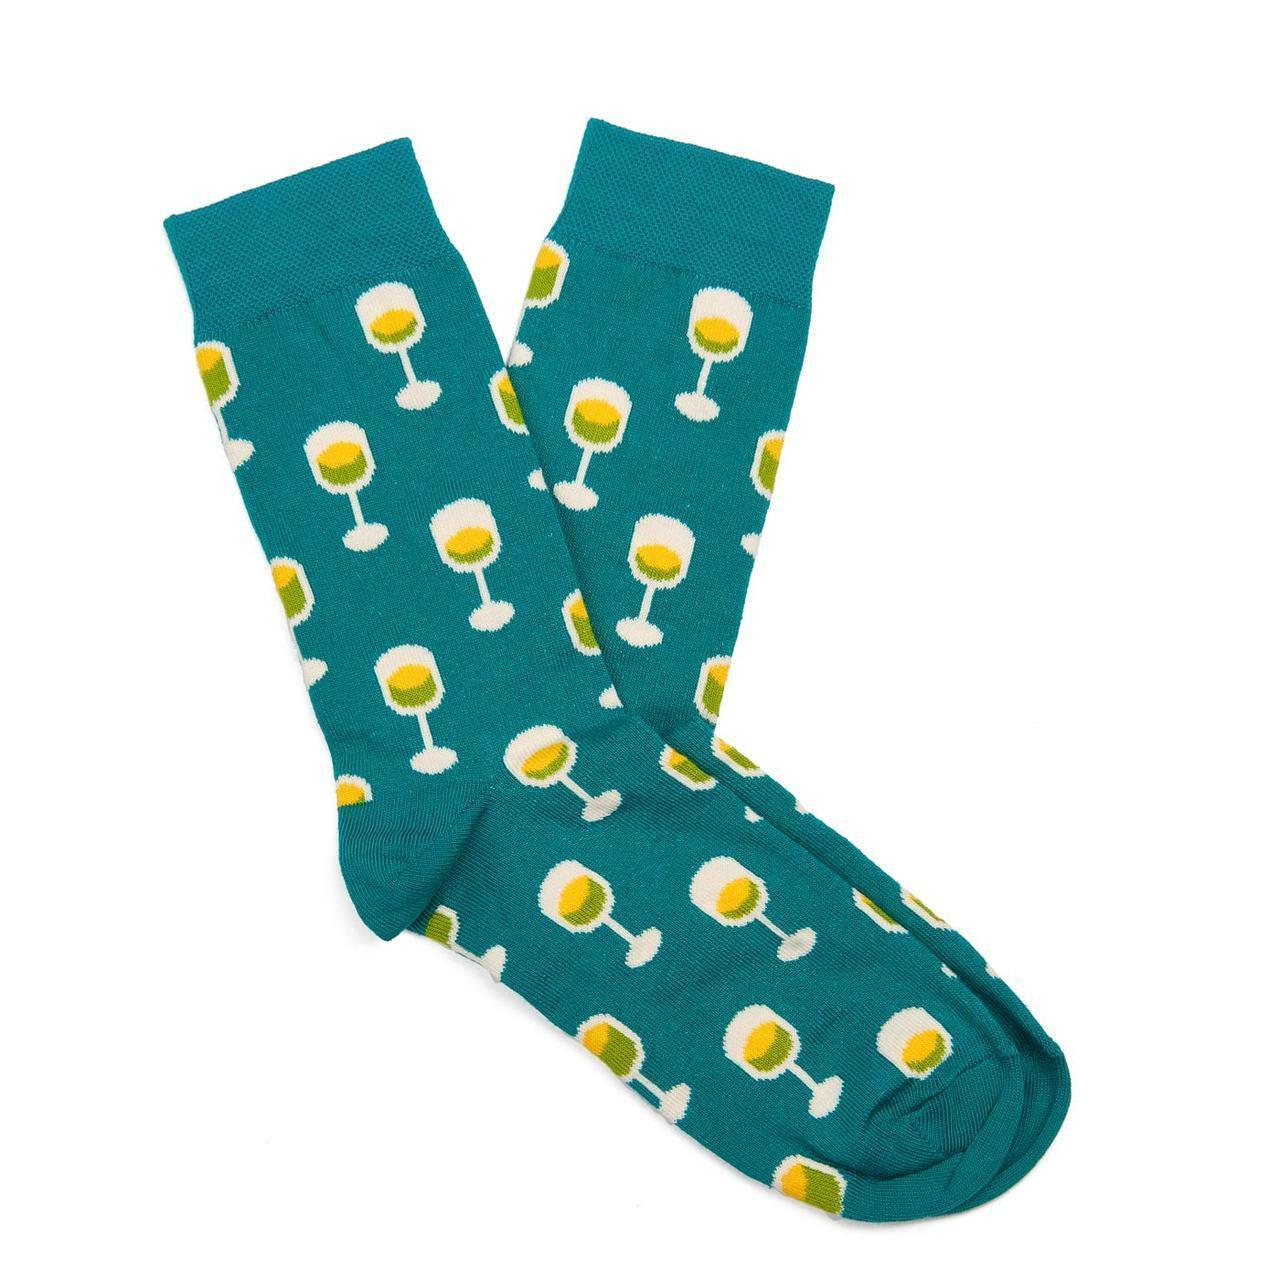 Носки женские с принтом Dodo Socks white 150ml 36-38 Бирюзовый